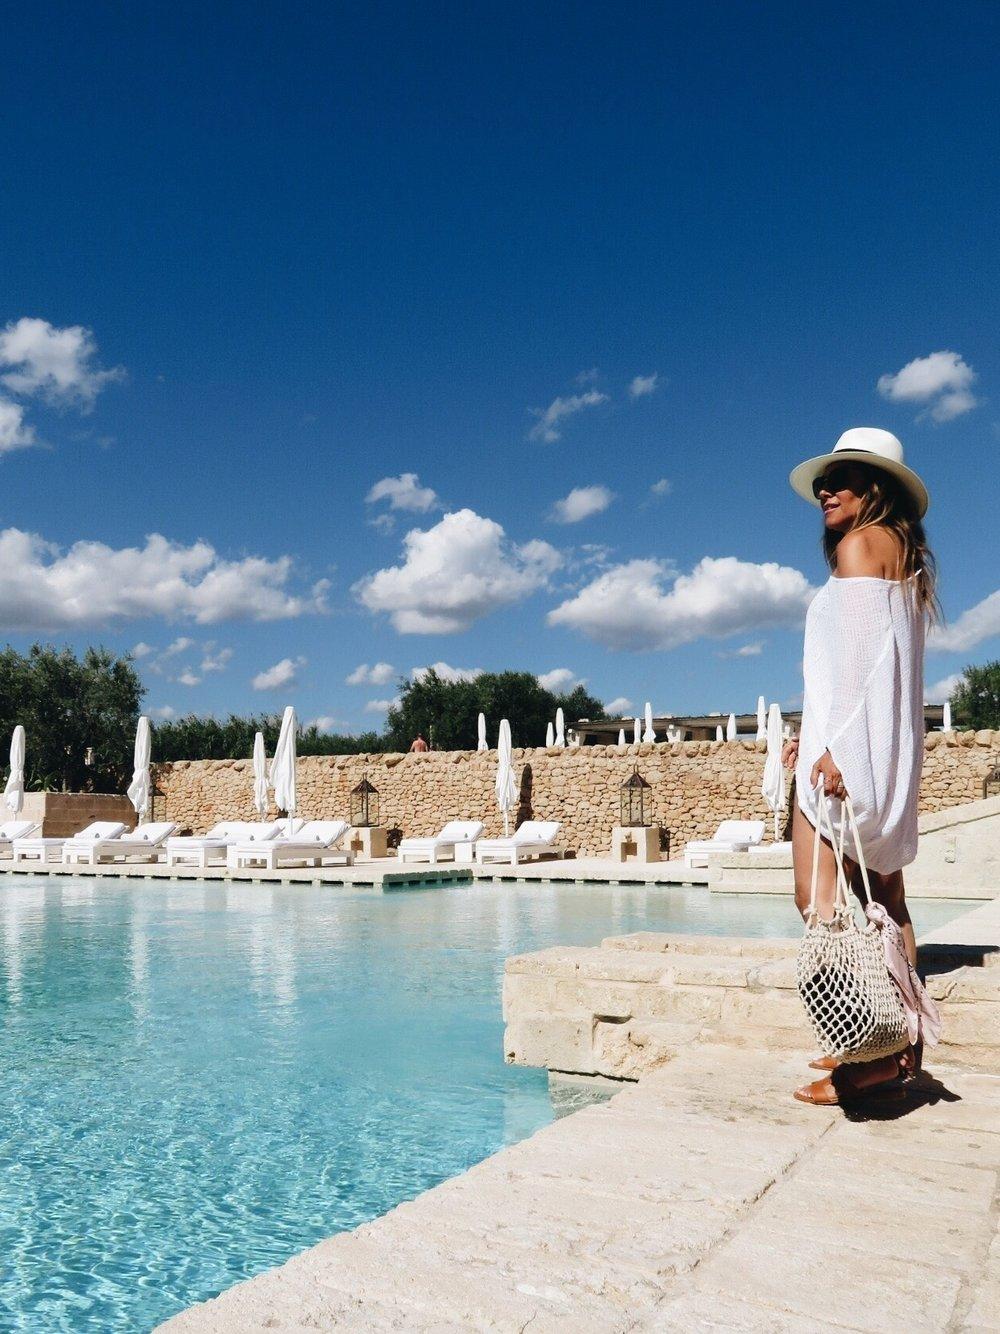 Poolside at the  Borgo Egnazia